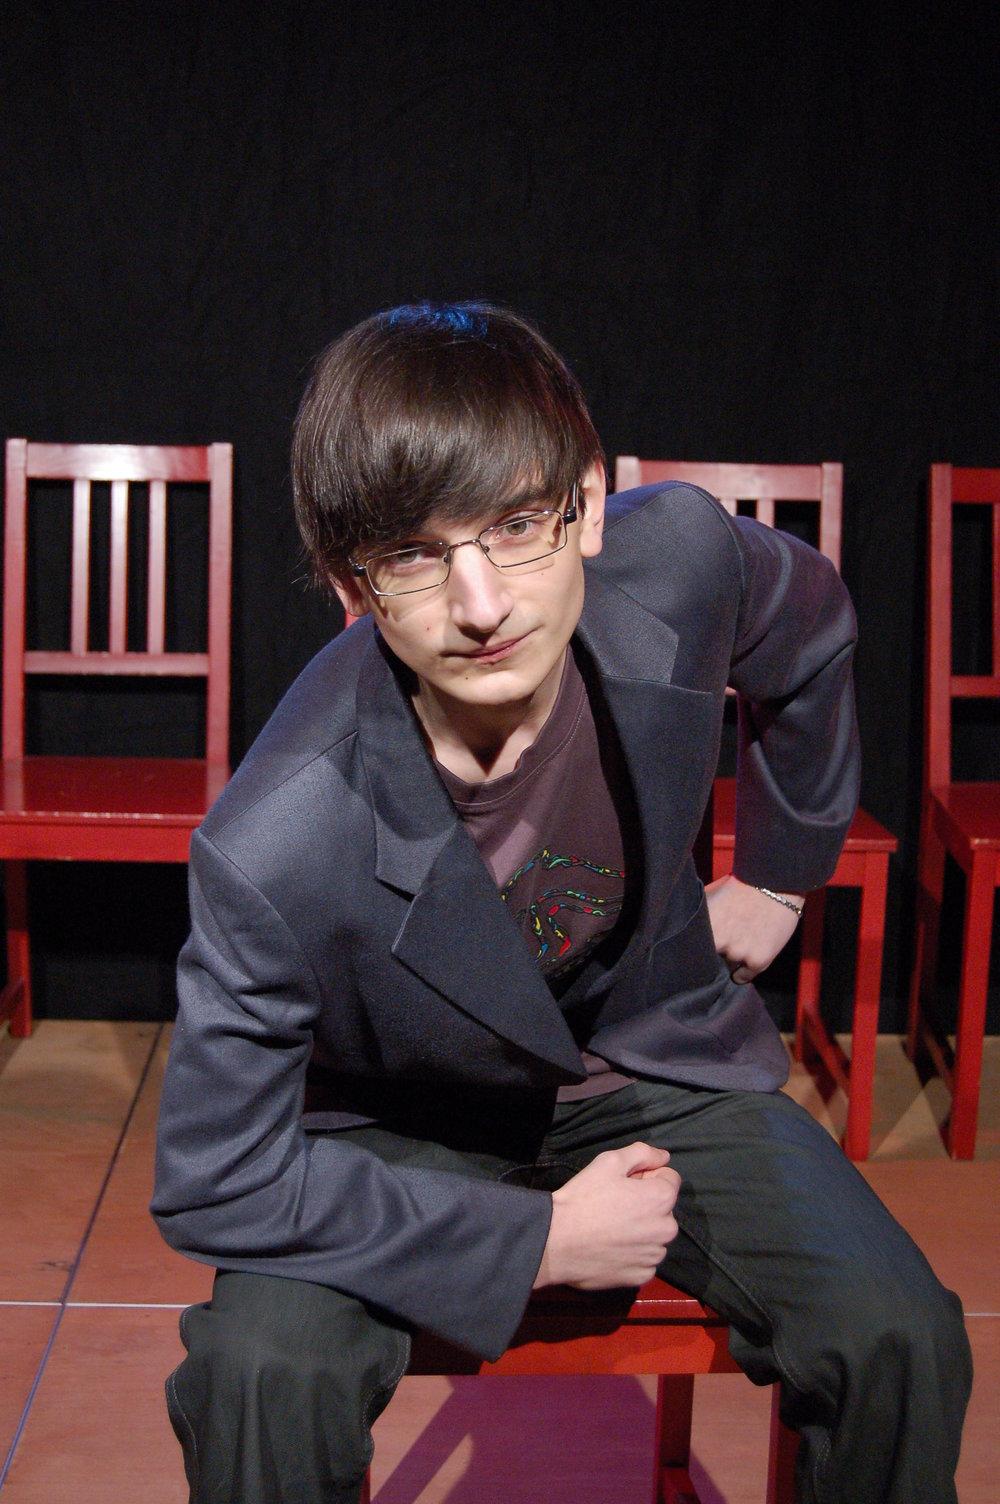 2010 pink Verlorene Liebesmüh 02.JPG